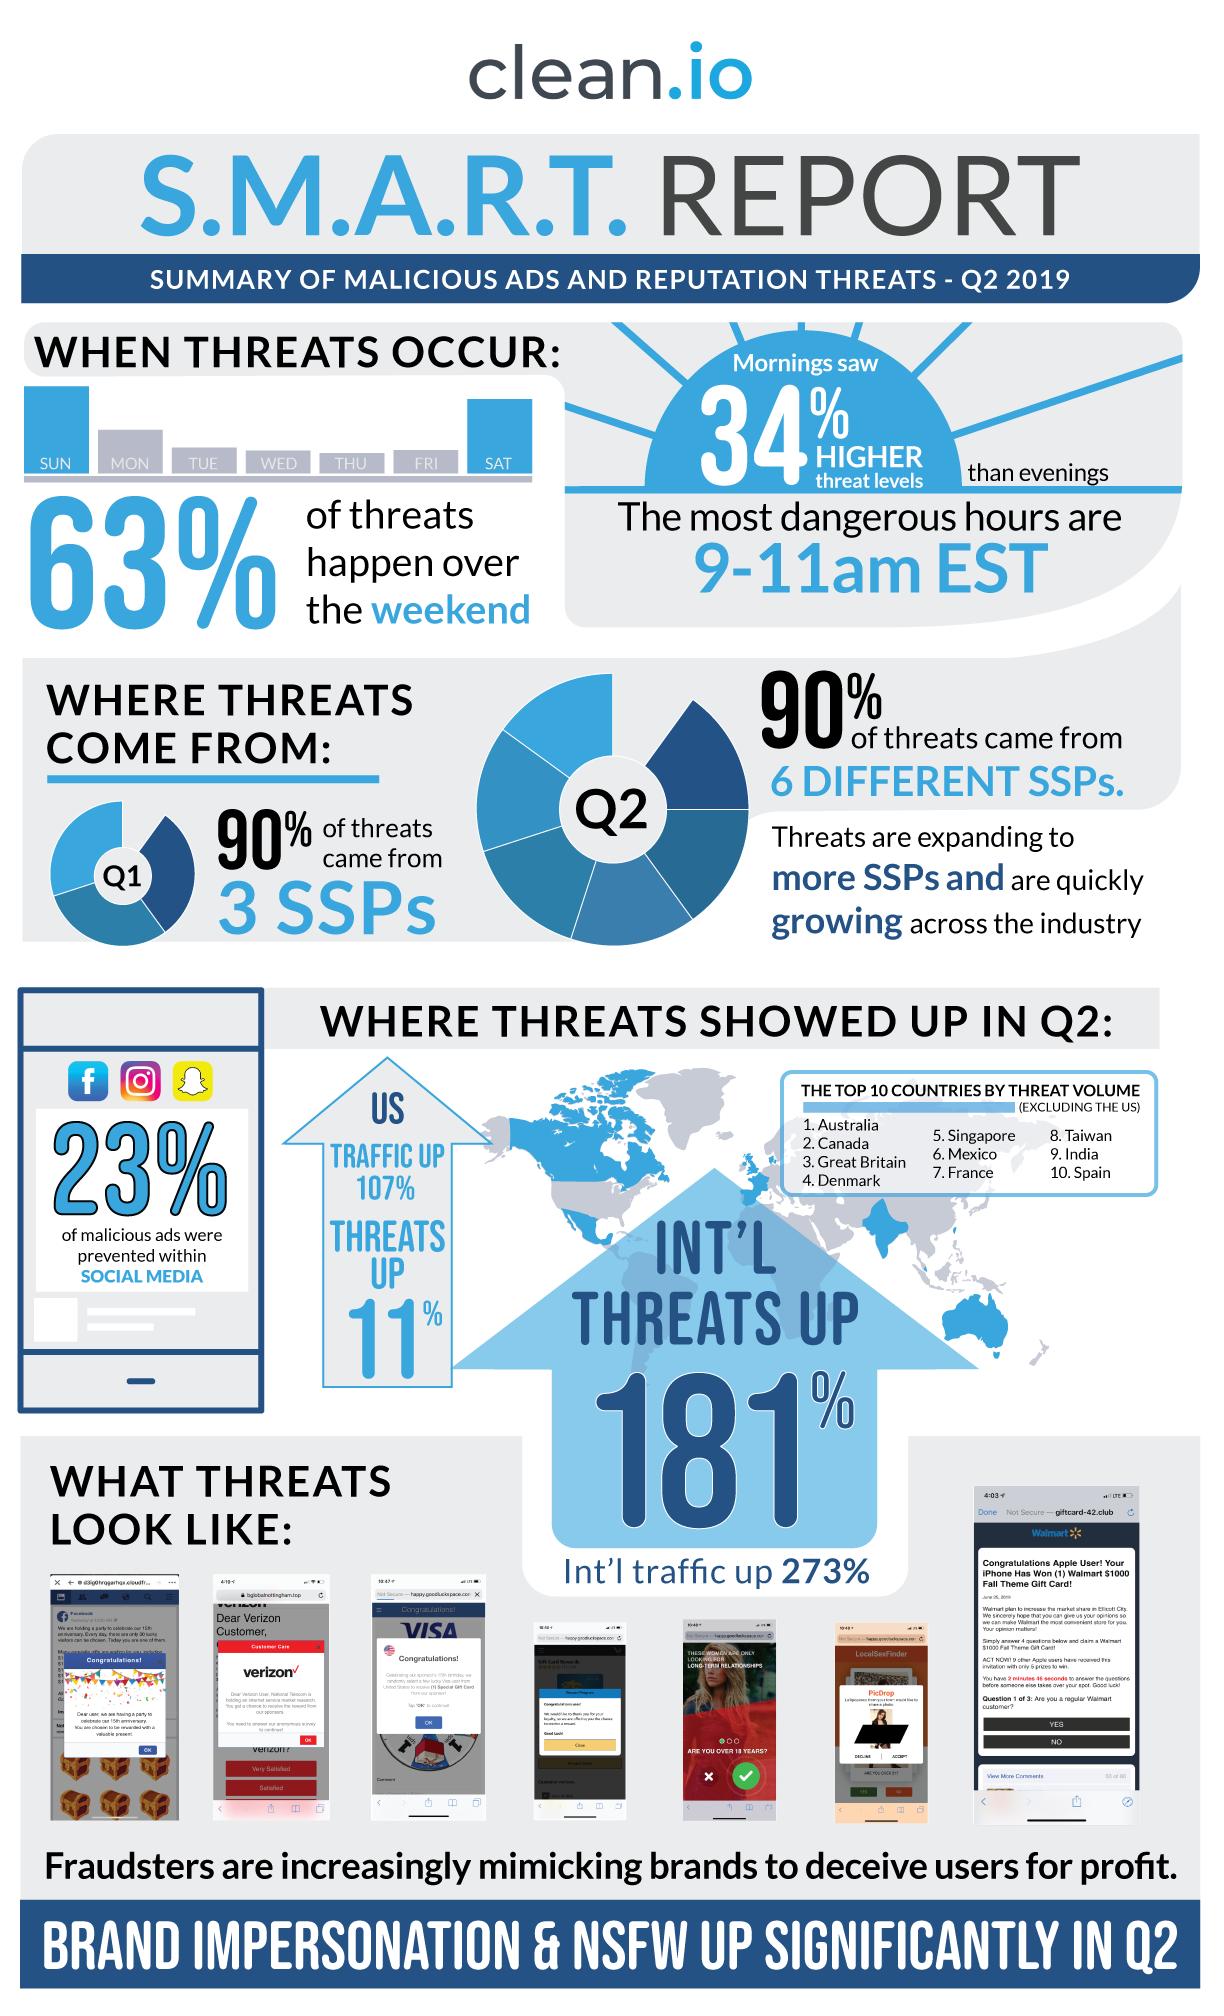 SMART Report infographic